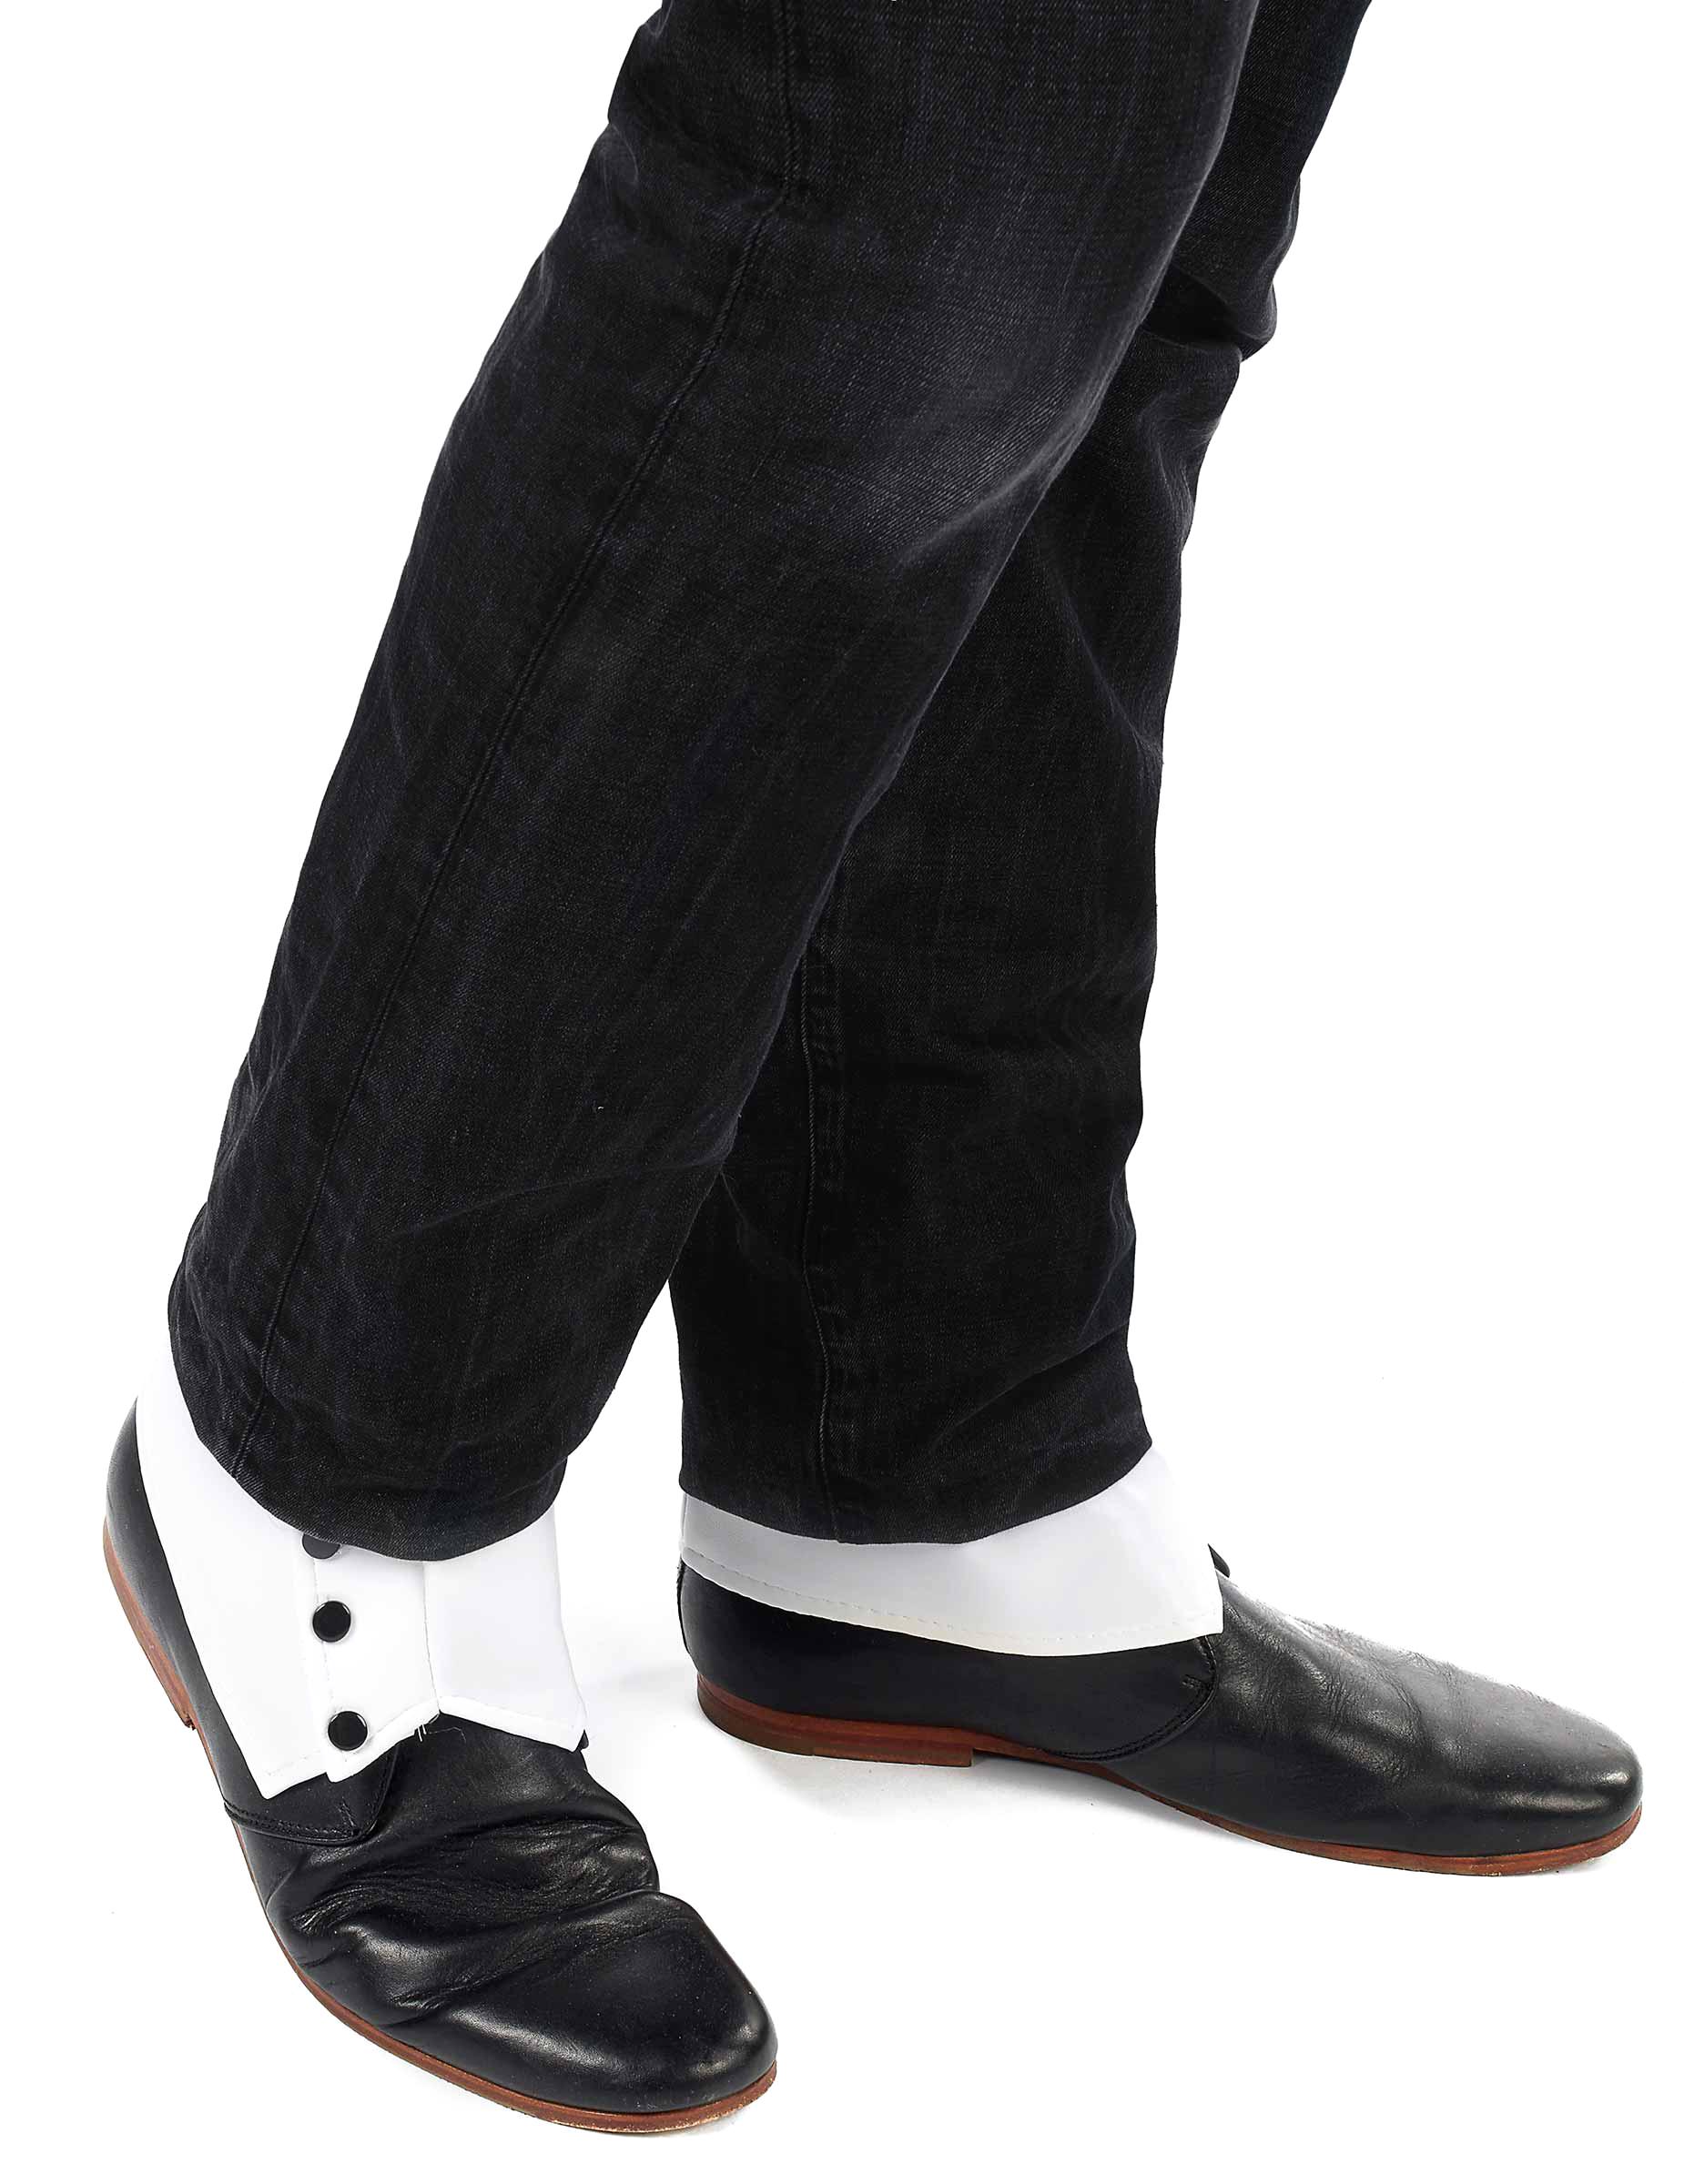 38840d90e Polaina blanca para hombre: Accesorios,y disfraces originales ...